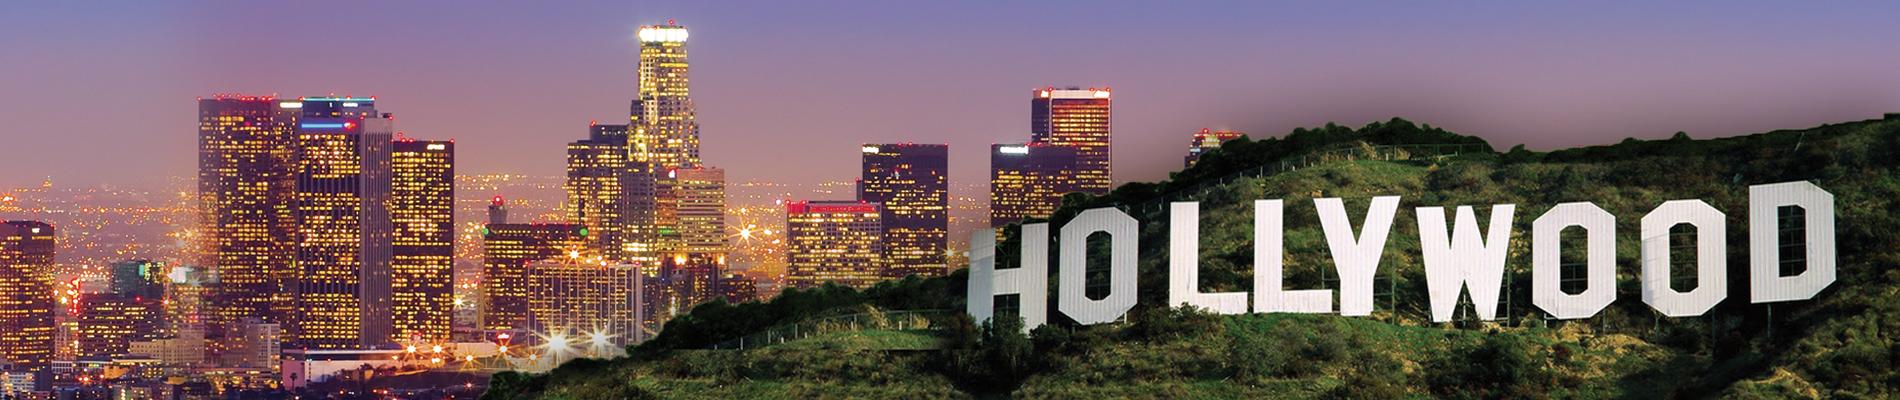 HollywoodCityBanner.jpg